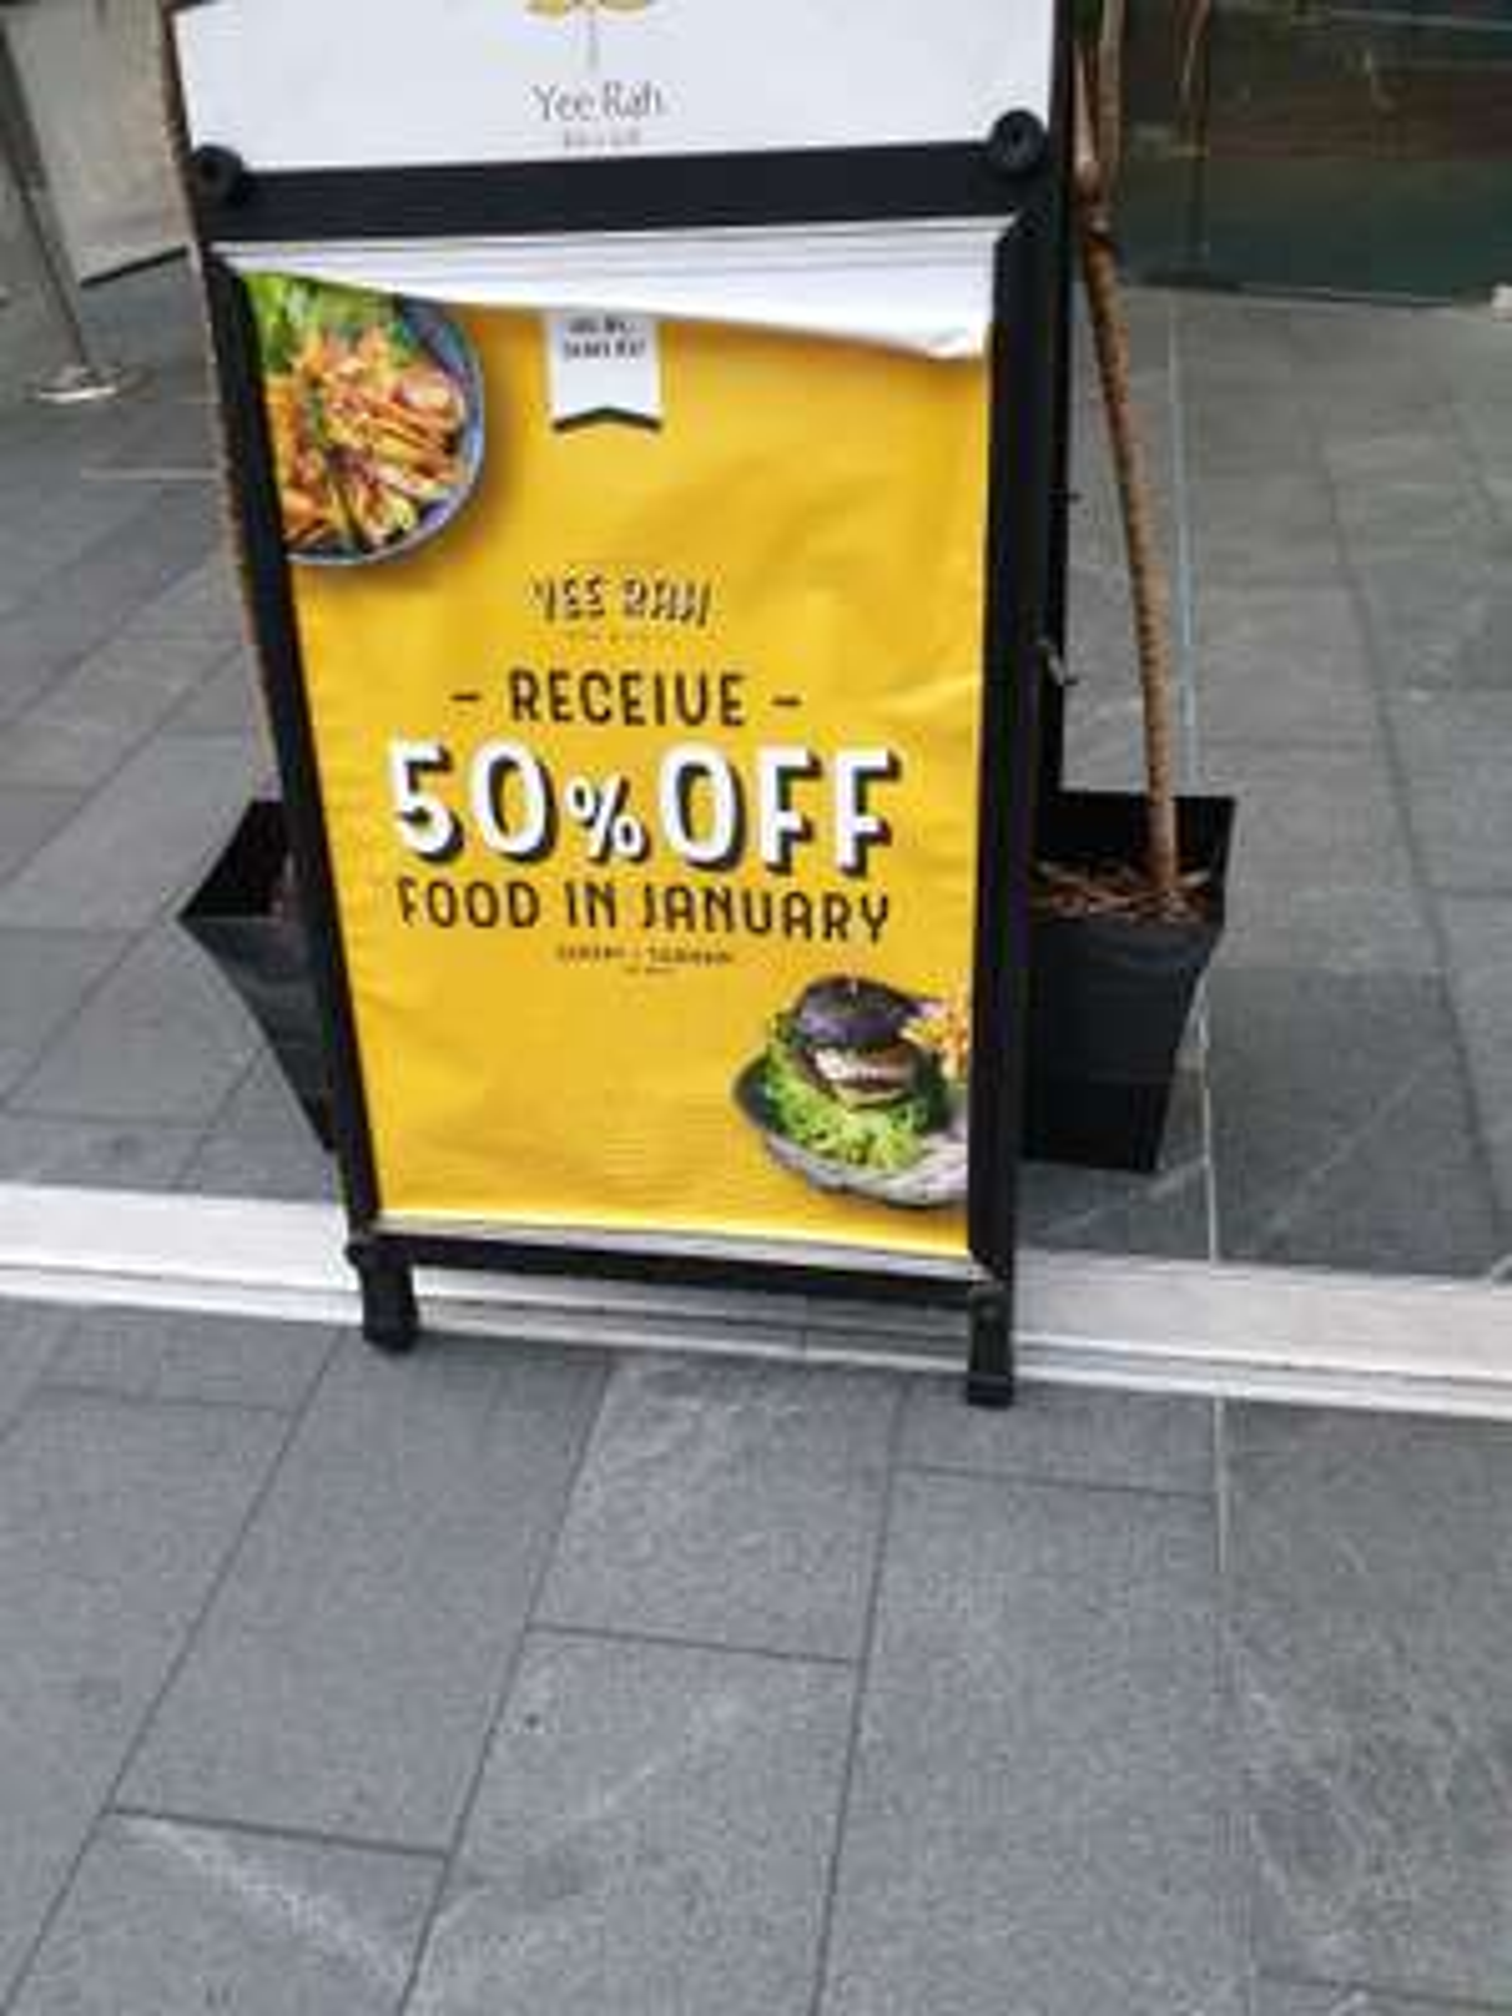 Yee Rah Liverpool 50% off your food bill